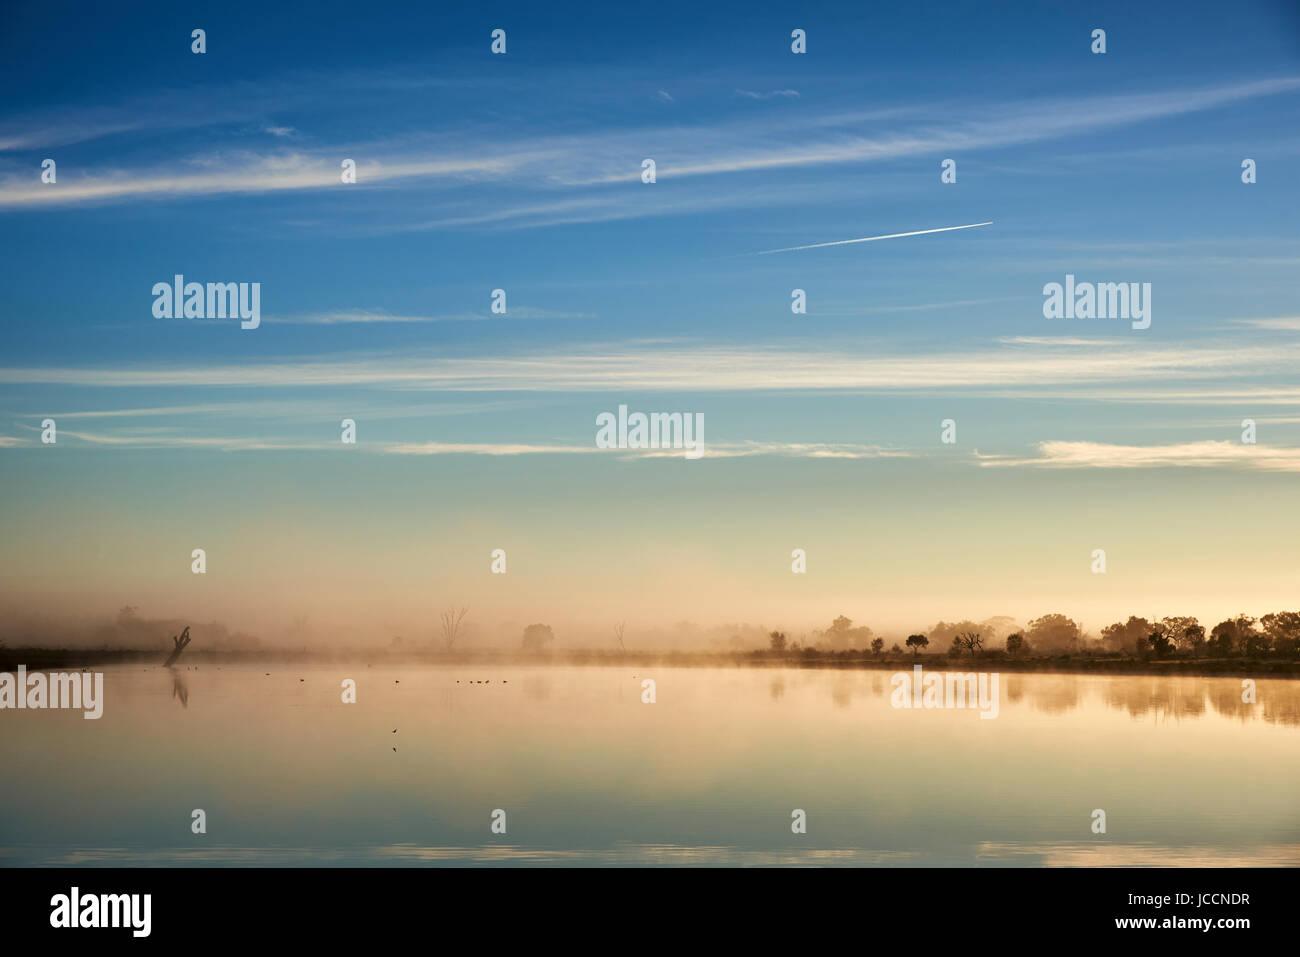 Early morning surface foog drifts over Billabong, Sunraysia Region, Victoria, Australia. - Stock Image